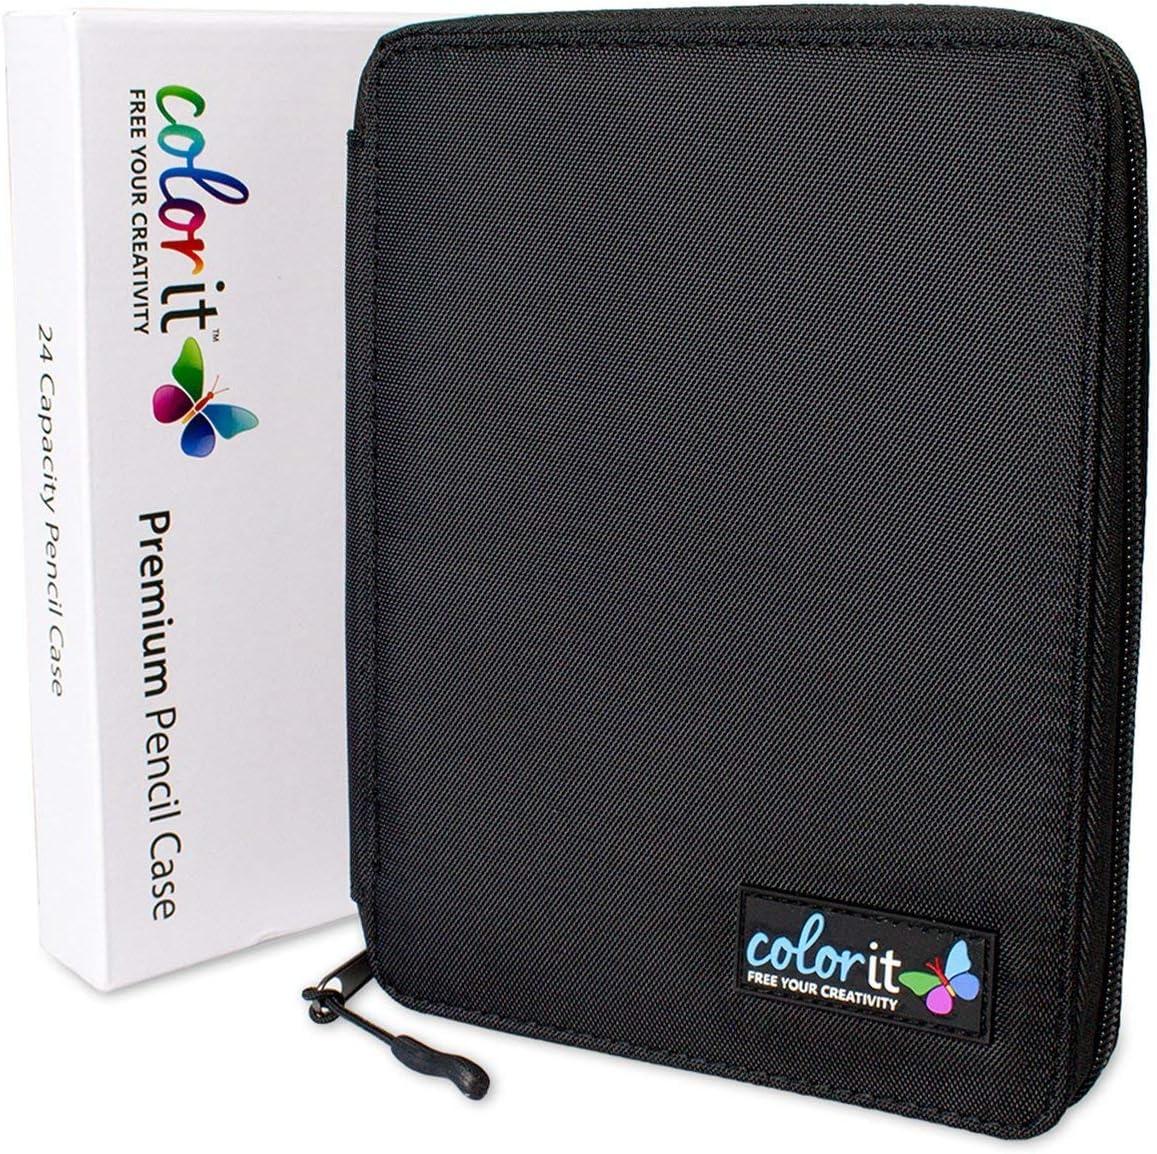 ColorIt Premium Zippered Travel Pencil Case for Colored Pencils 48 Slot Pencil Holder